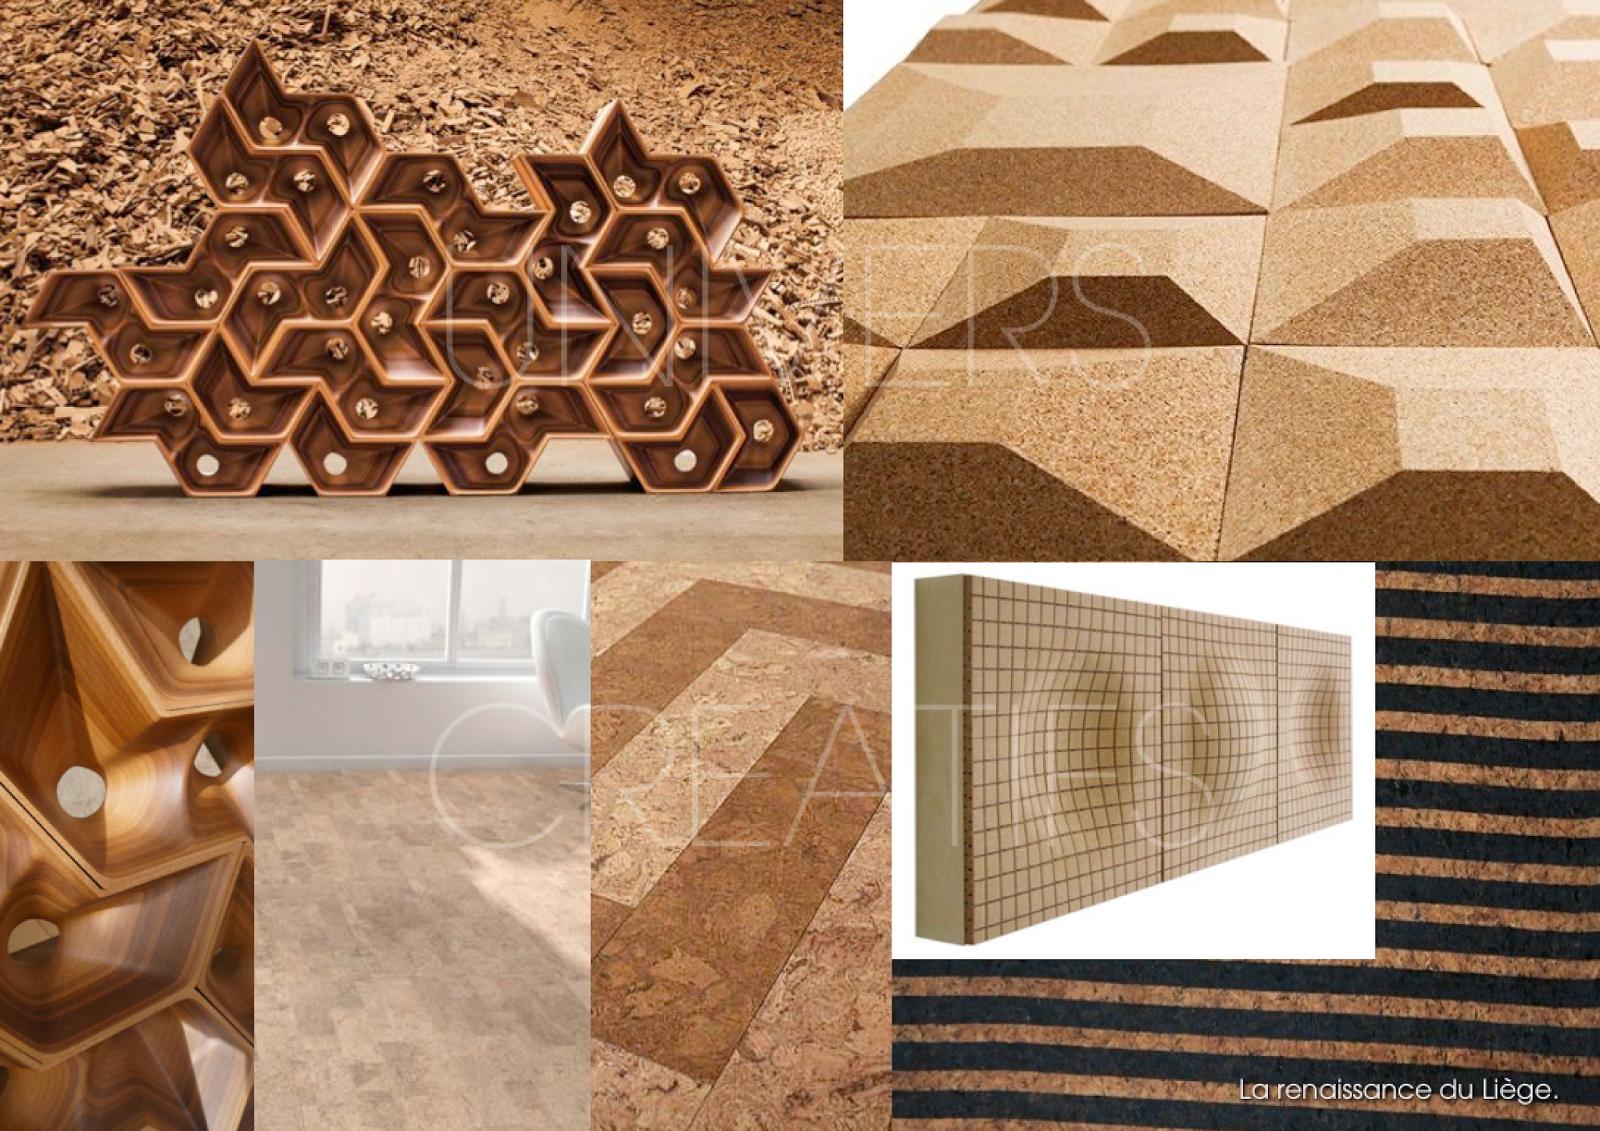 univers creatifs la renaissance du li ge 5 wood. Black Bedroom Furniture Sets. Home Design Ideas